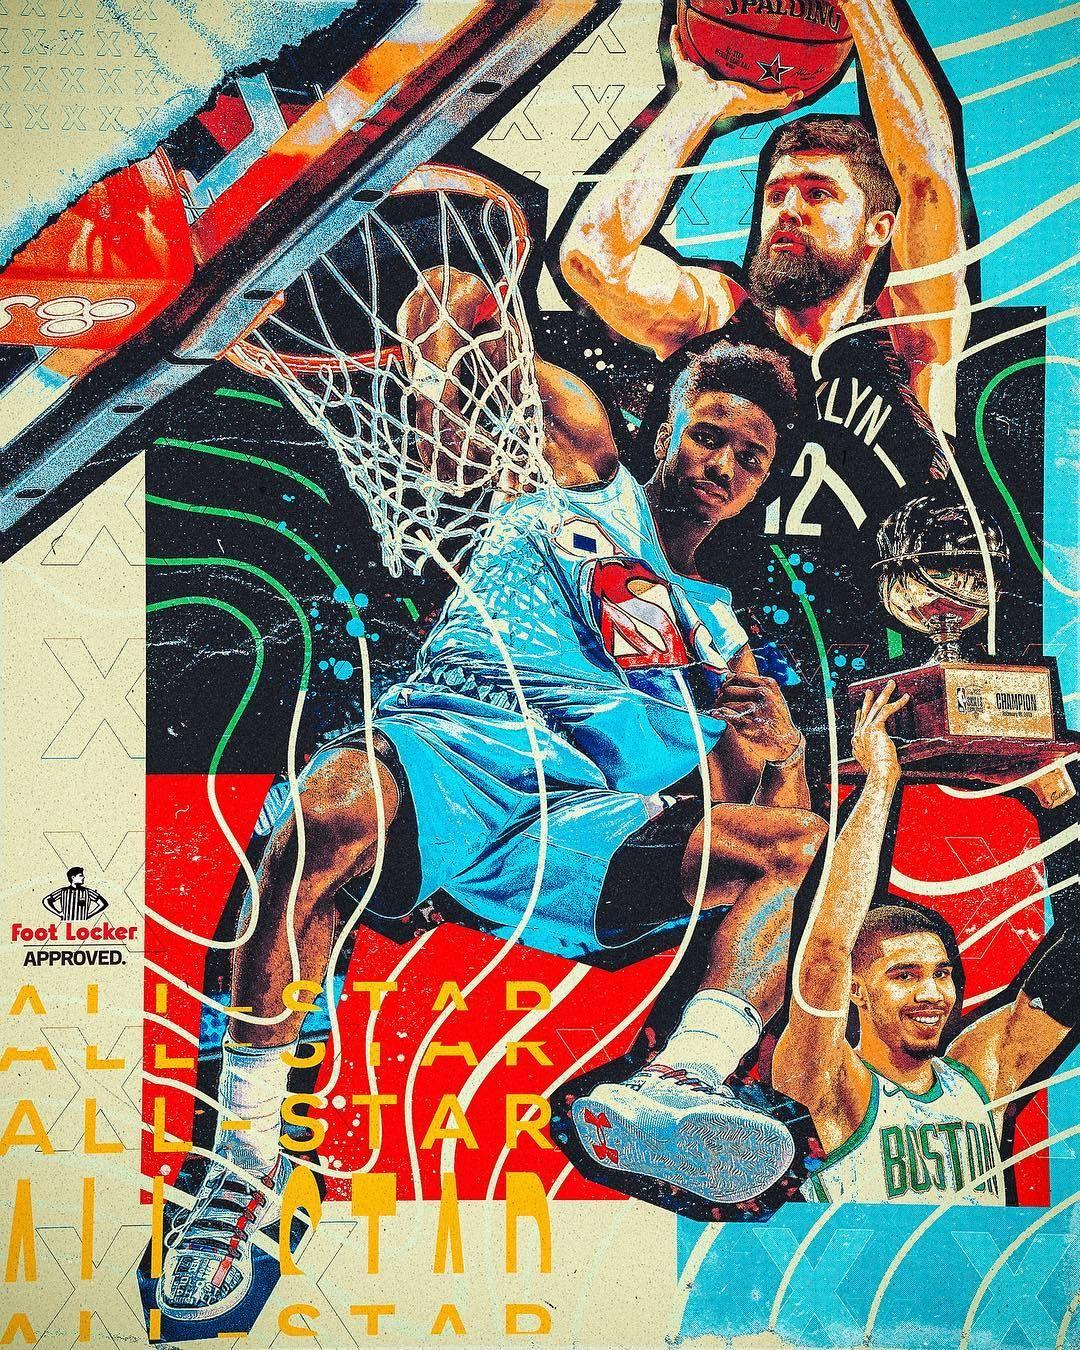 Nba All Star Saturday Night Recap What Was Your Fav Event Digital Illustration For Footlocker Au Sports Graphics Nba Wallpapers Basketball Wallpaper